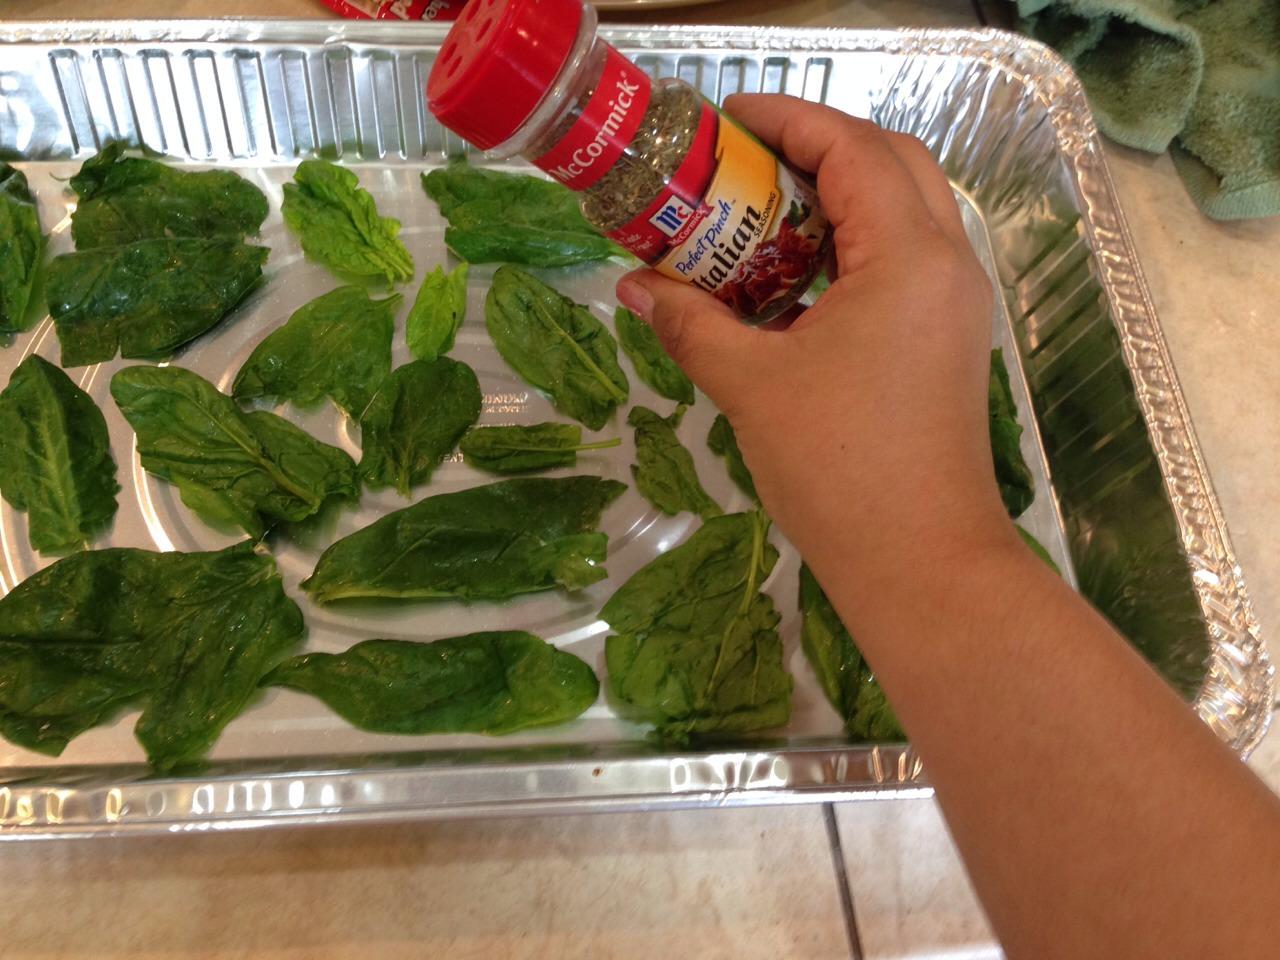 Add Italian seasoning. Again, a little goes a long way.